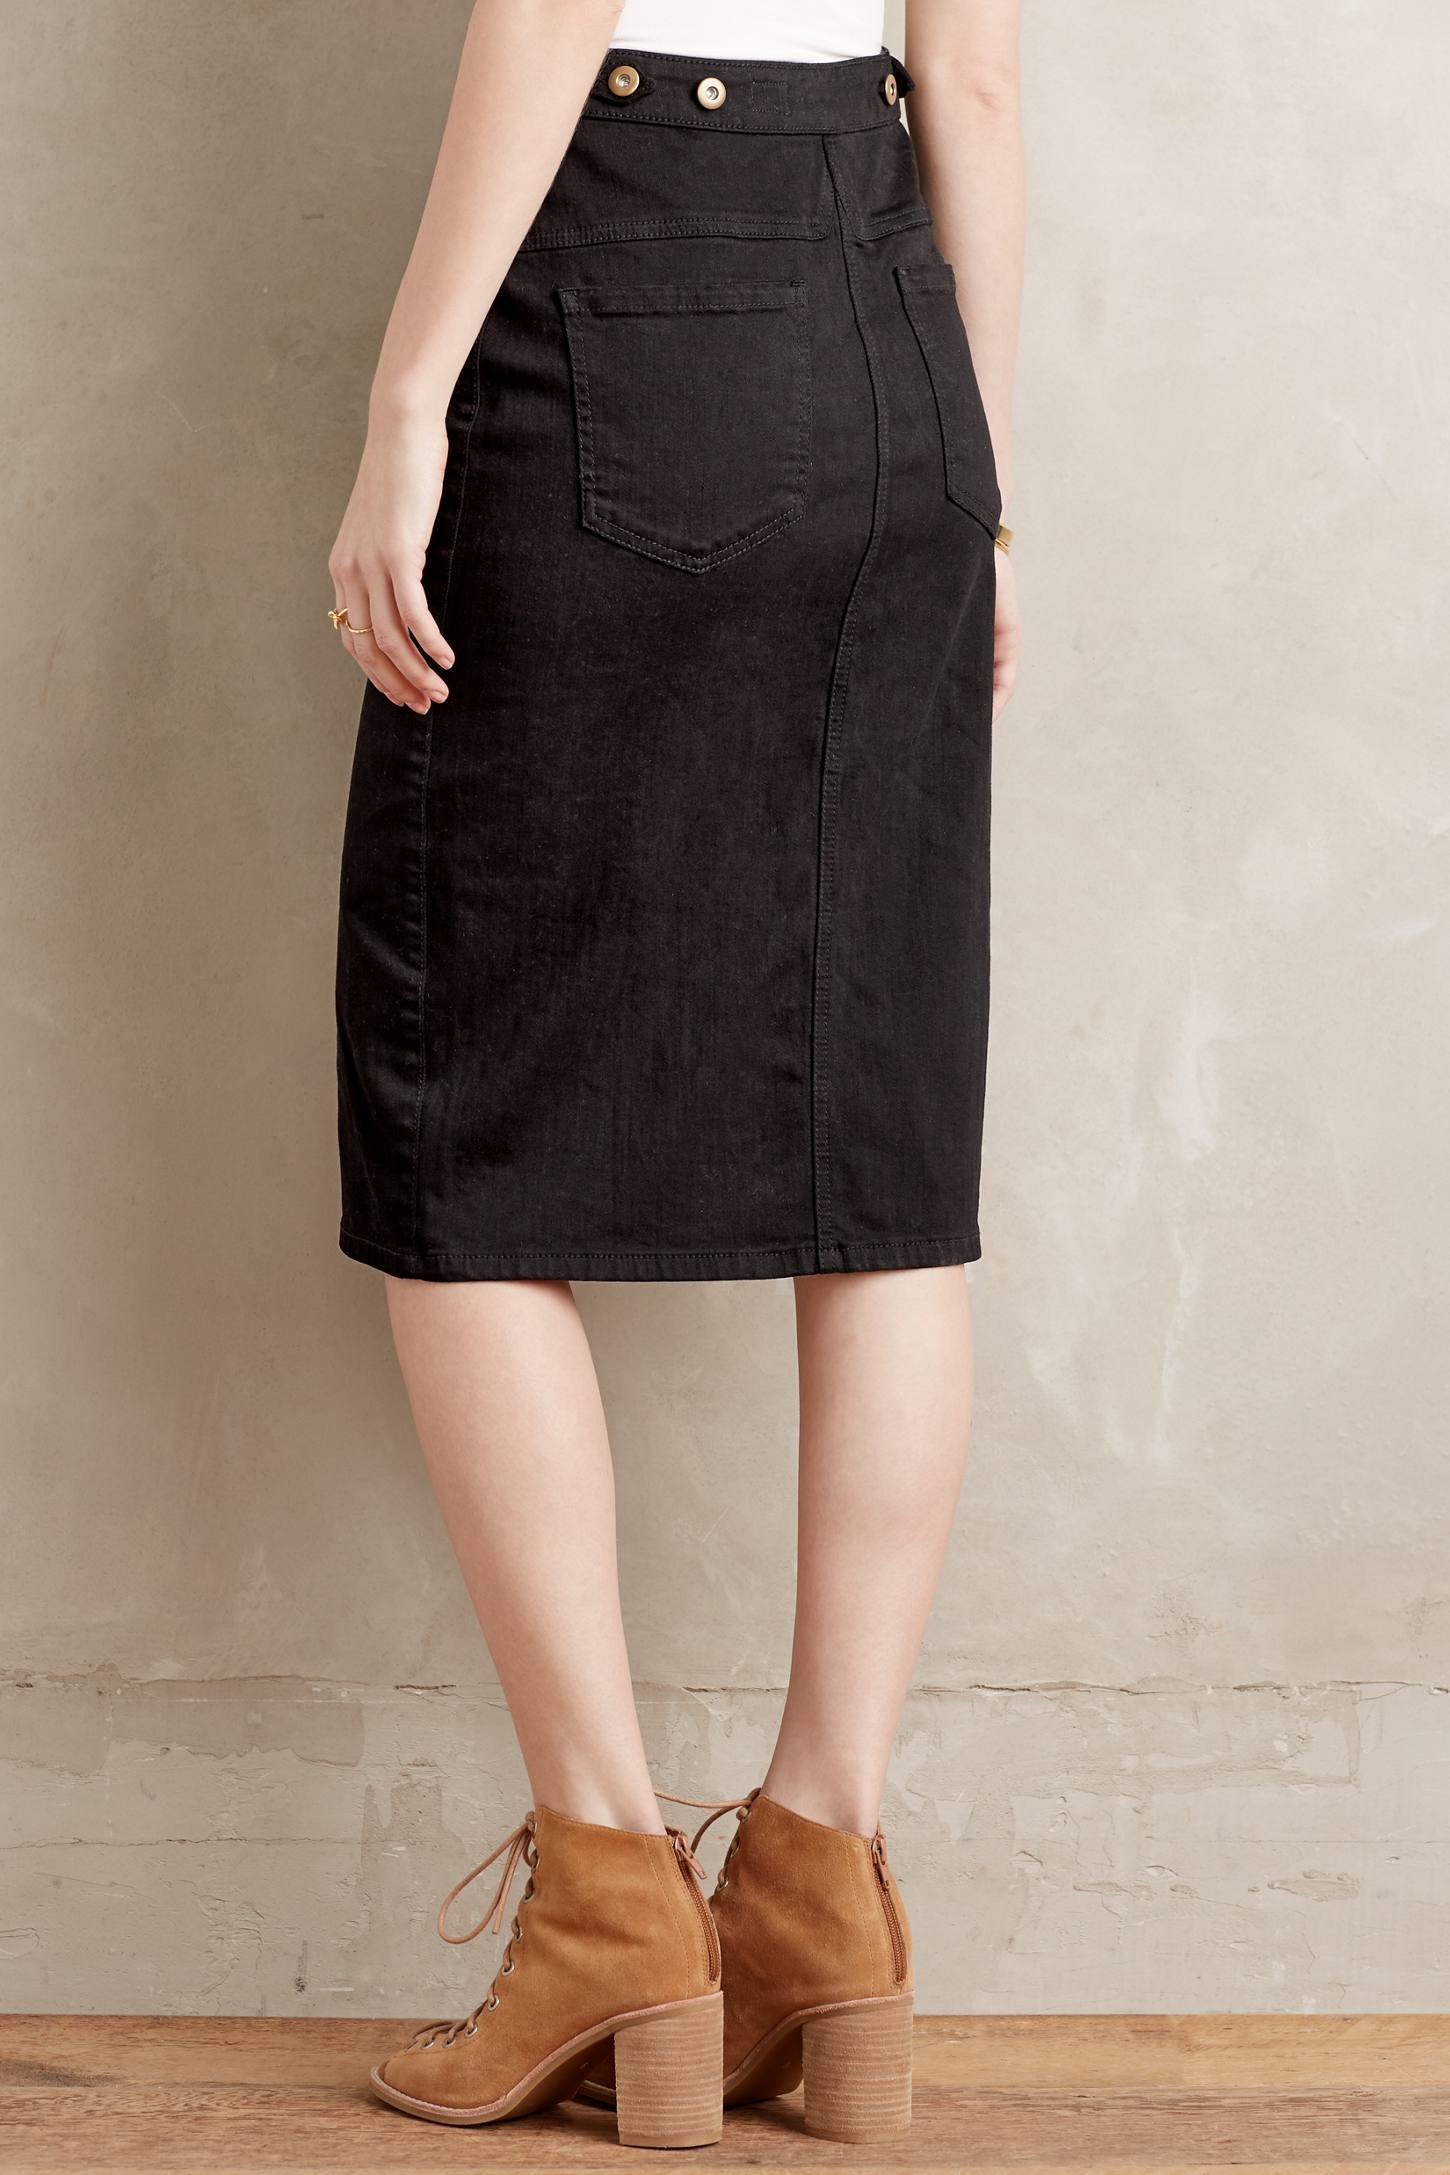 Anthropologie Denim Pencil Skirt in Black | Lyst